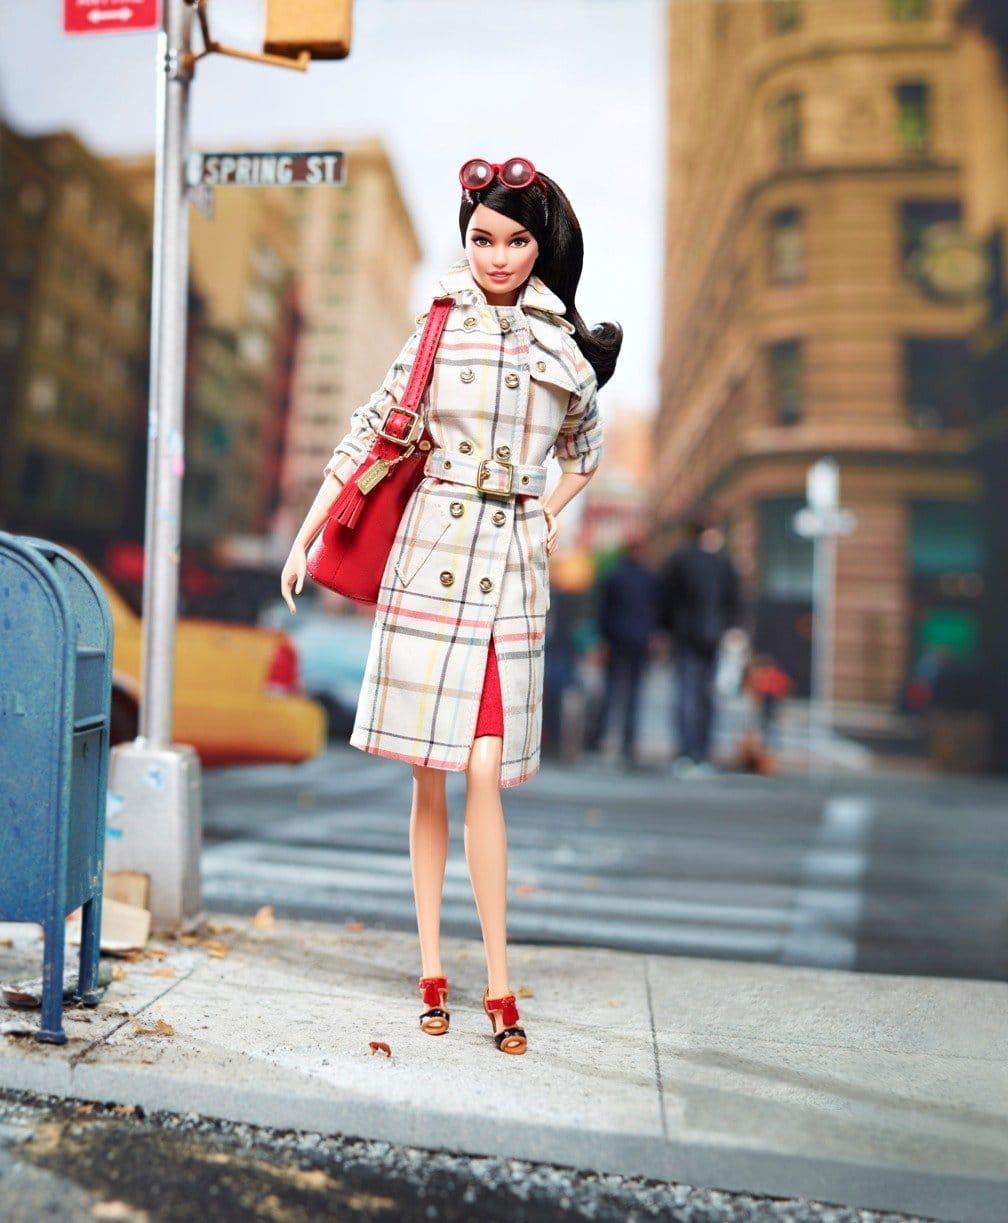 barbie-coach-designed-1